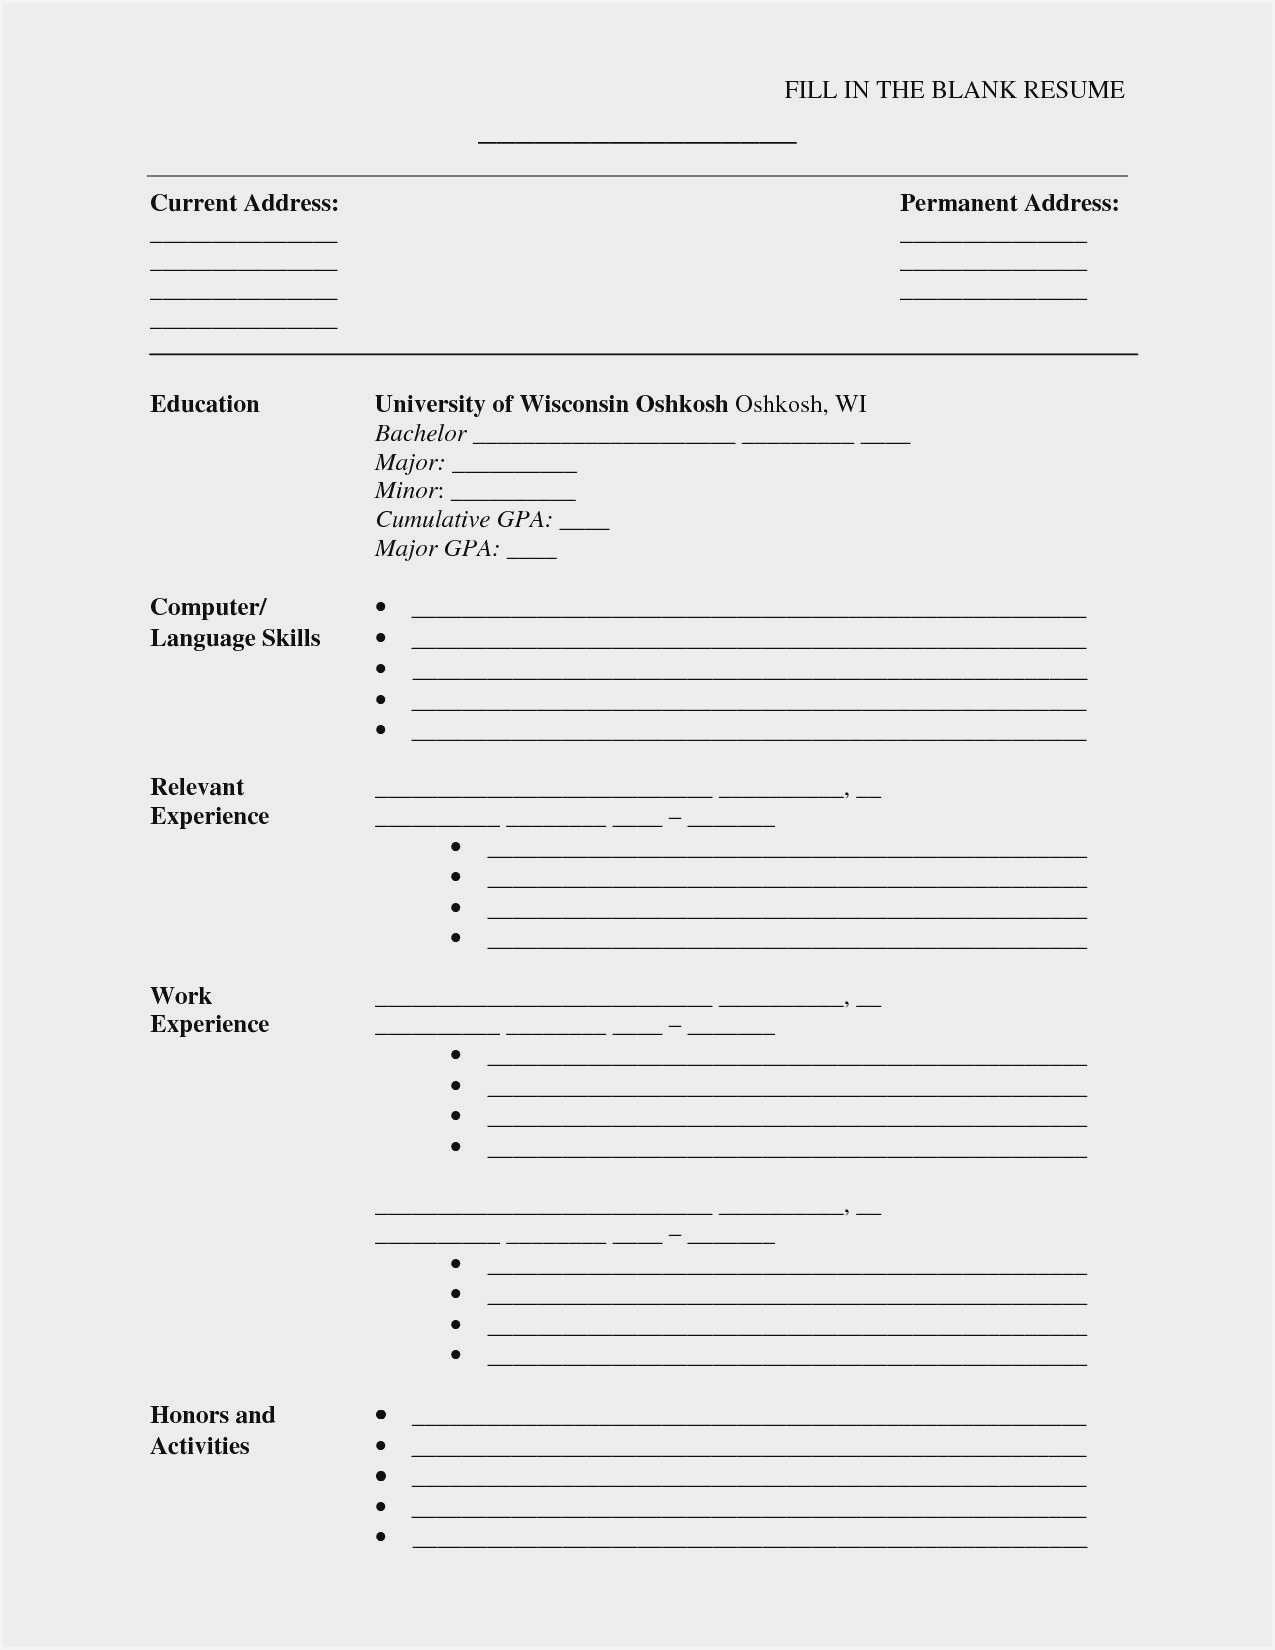 Blank Cv Format Word Download - Resume : Resume Sample #3945 Throughout Free Blank Cv Template Download